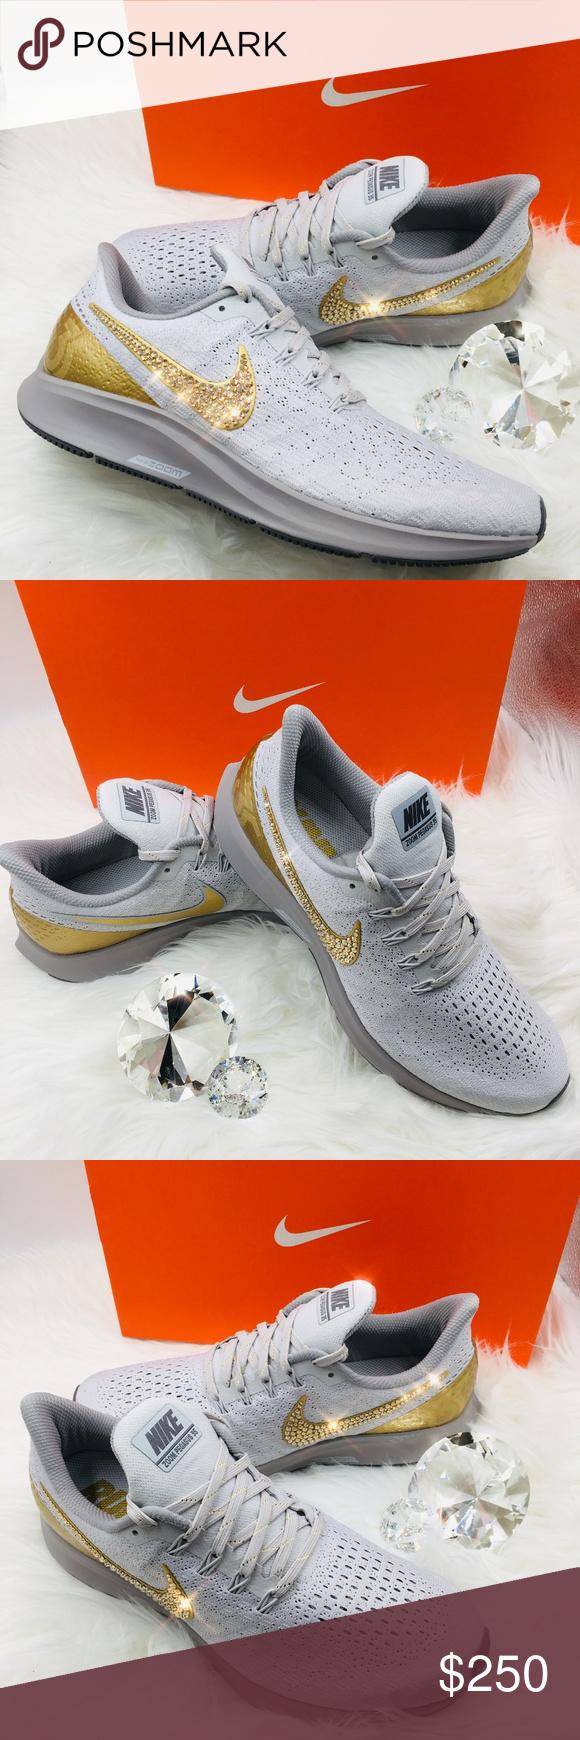 6bbfffb100f1 Bling Nike Air Zoom Pegasus 35 Premium Metallic STUNNING!! Brand New Nike  Air Zoom